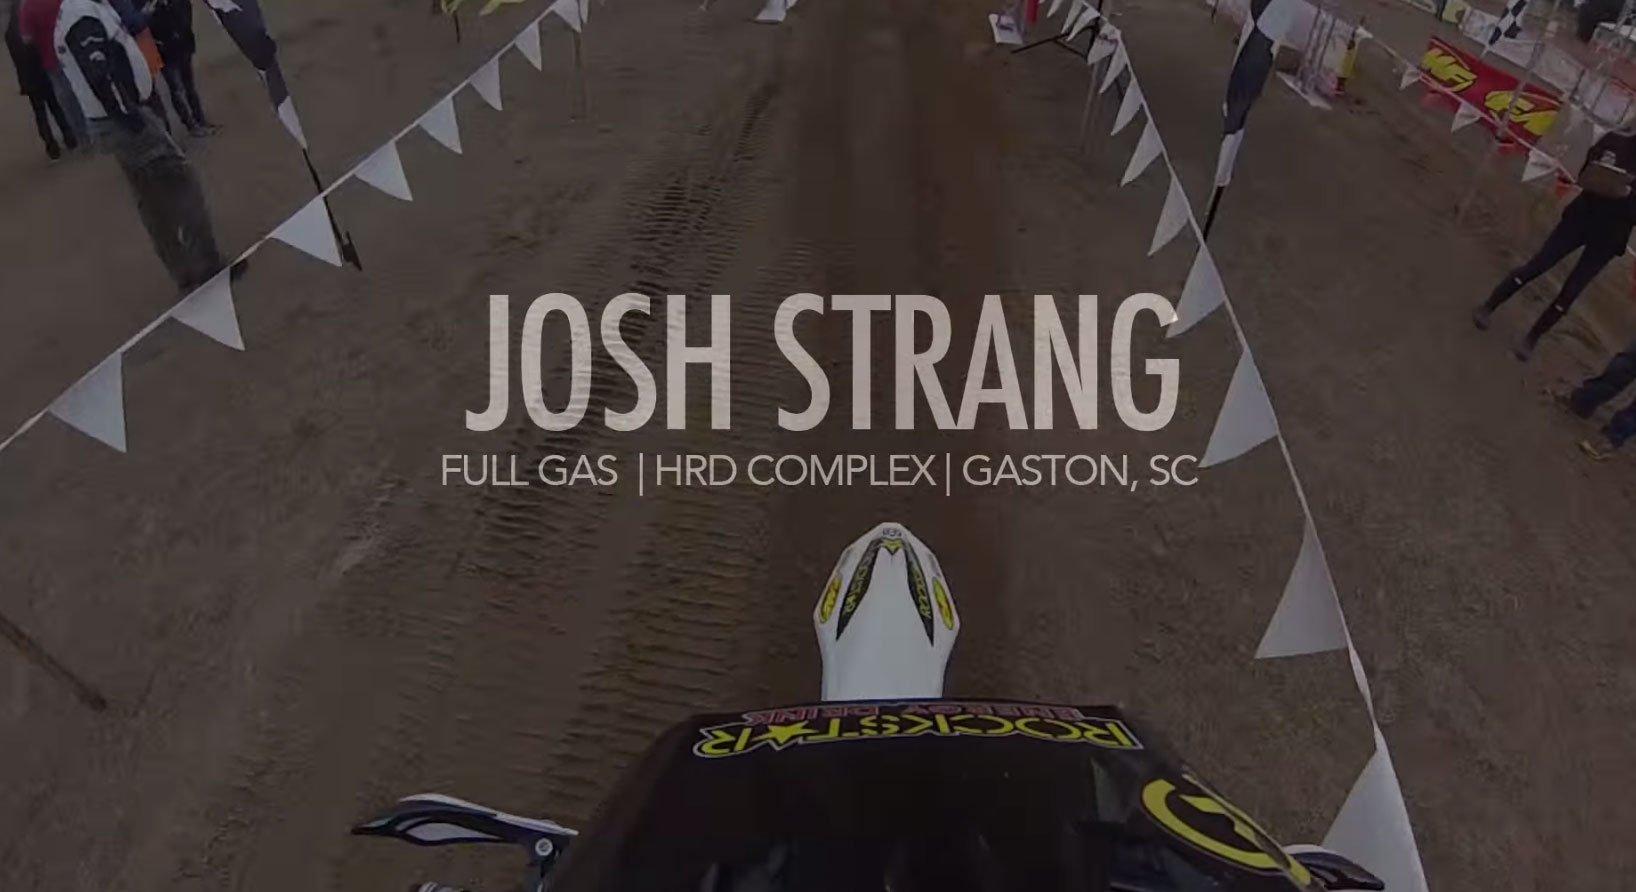 Josh Strang Round One Enduro Test GoPro